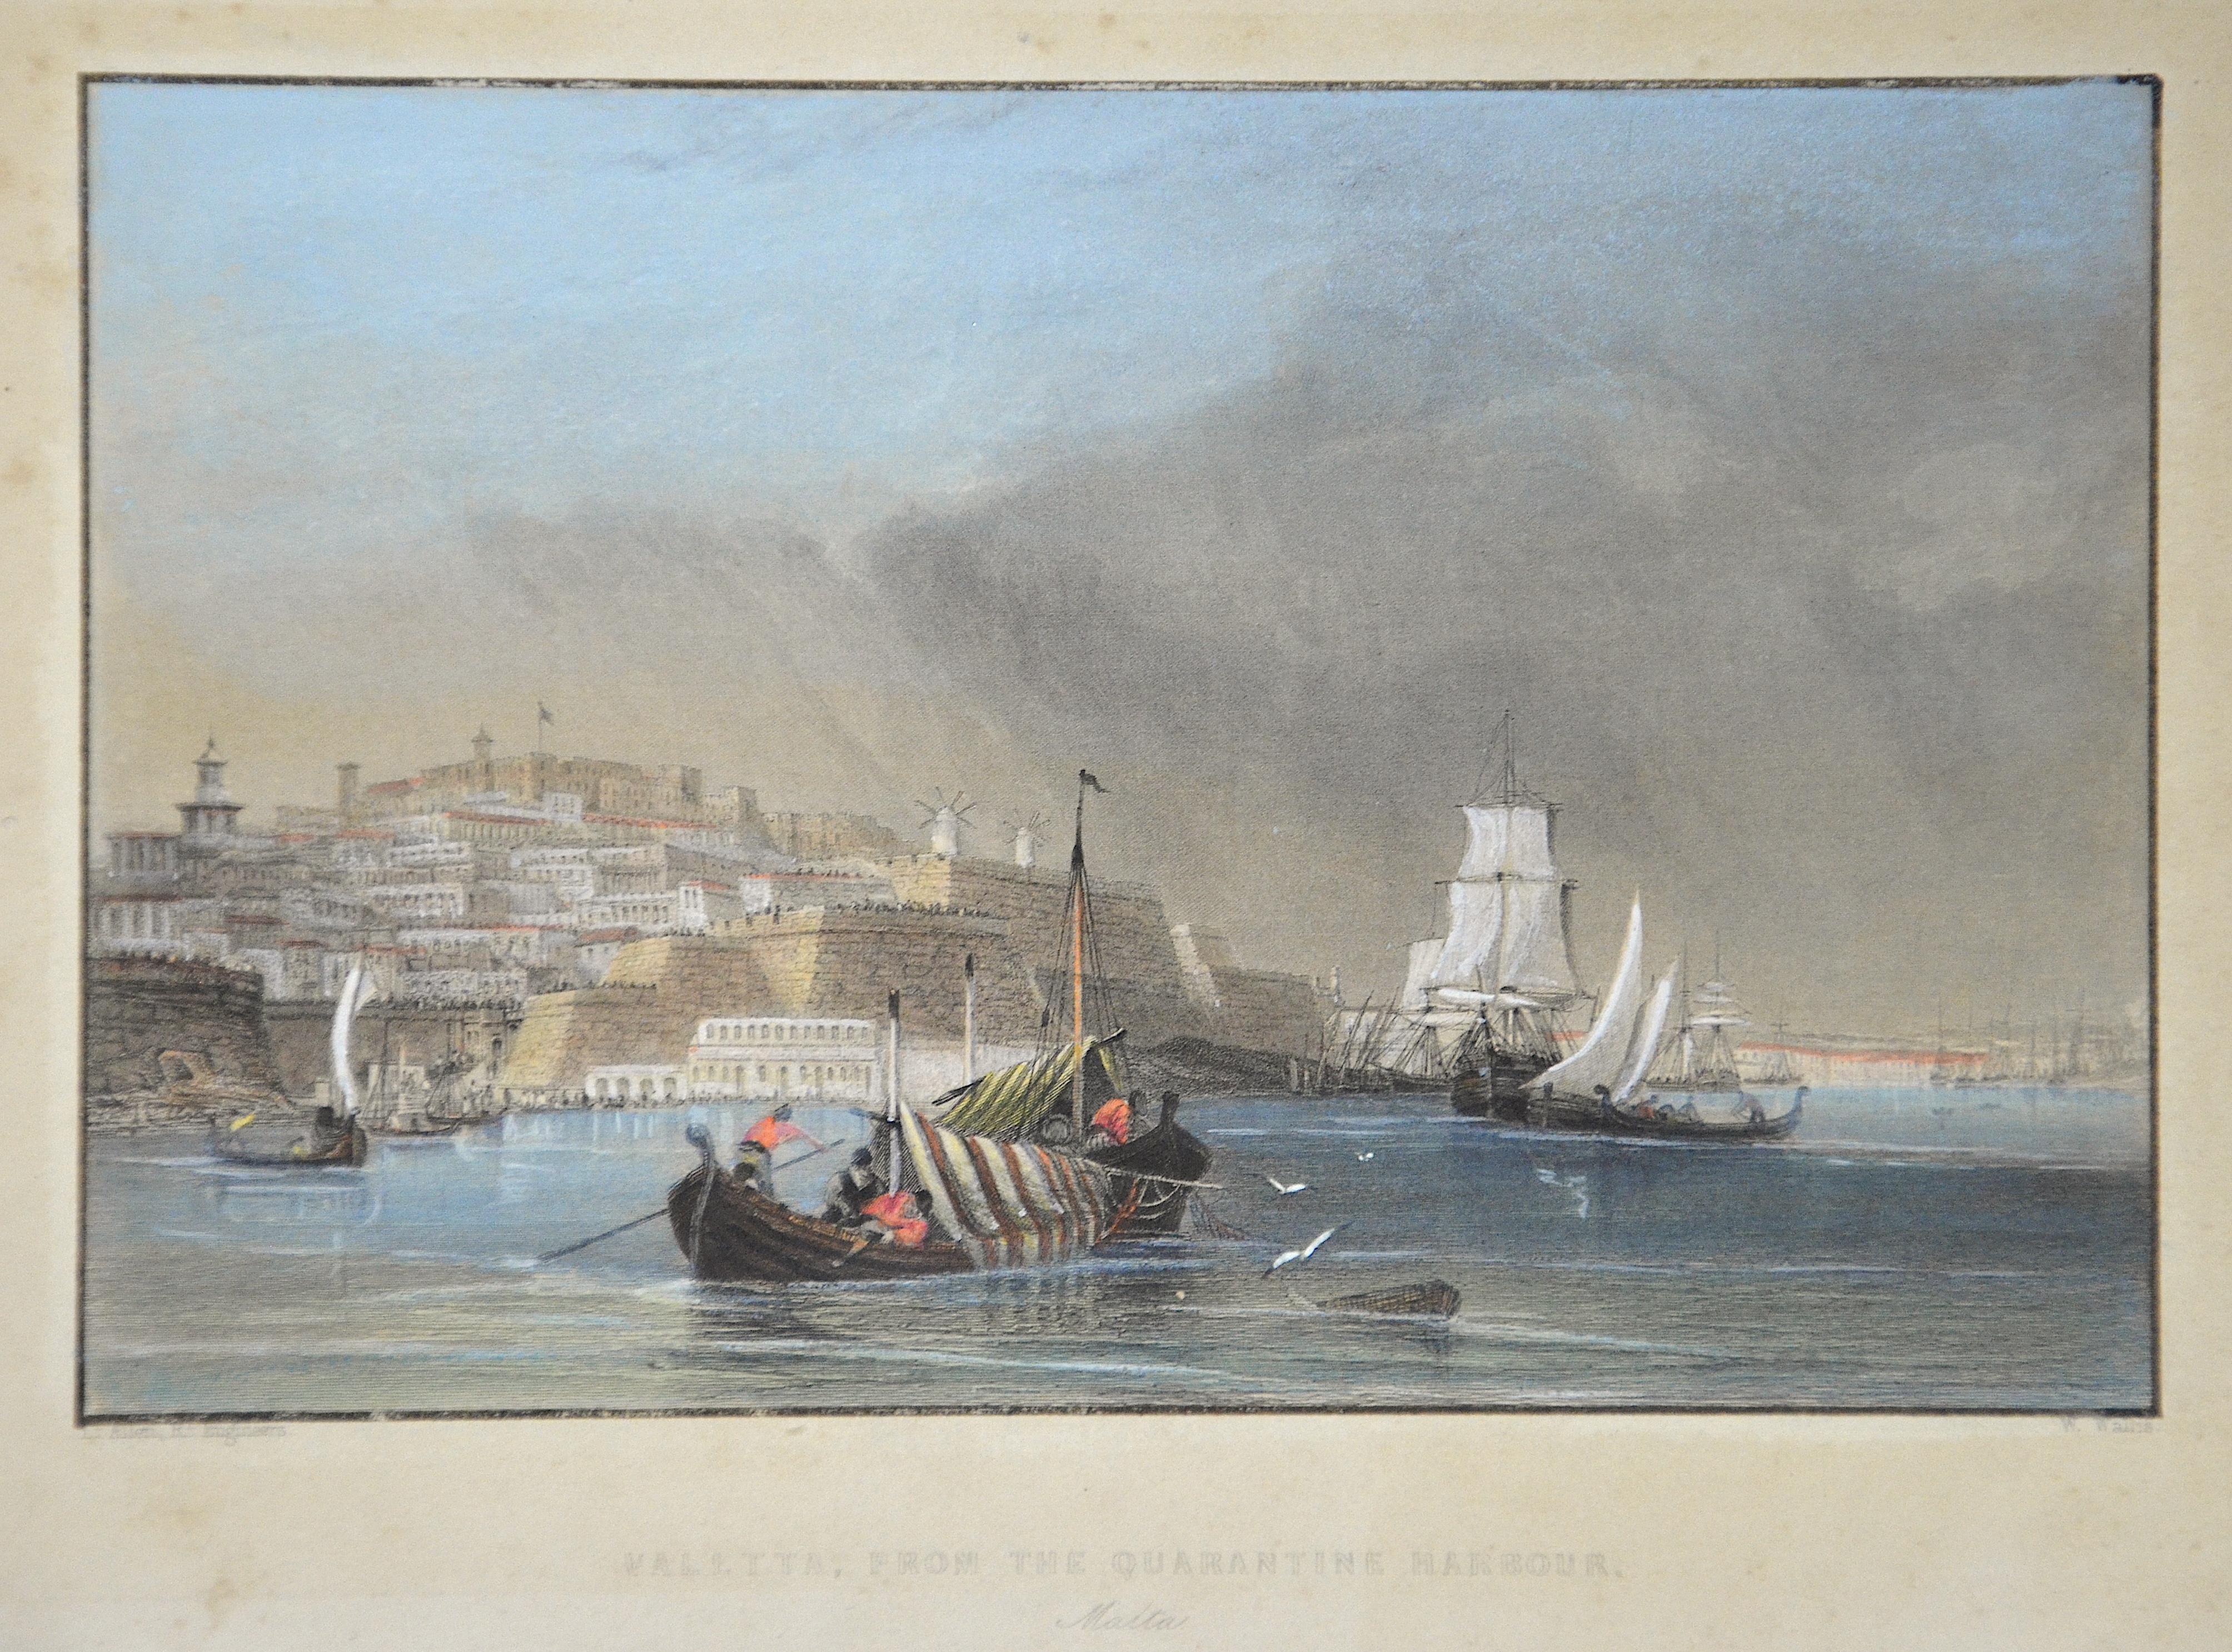 Fisher, Son  Valetta, from the Quarantine Harbour. Malta